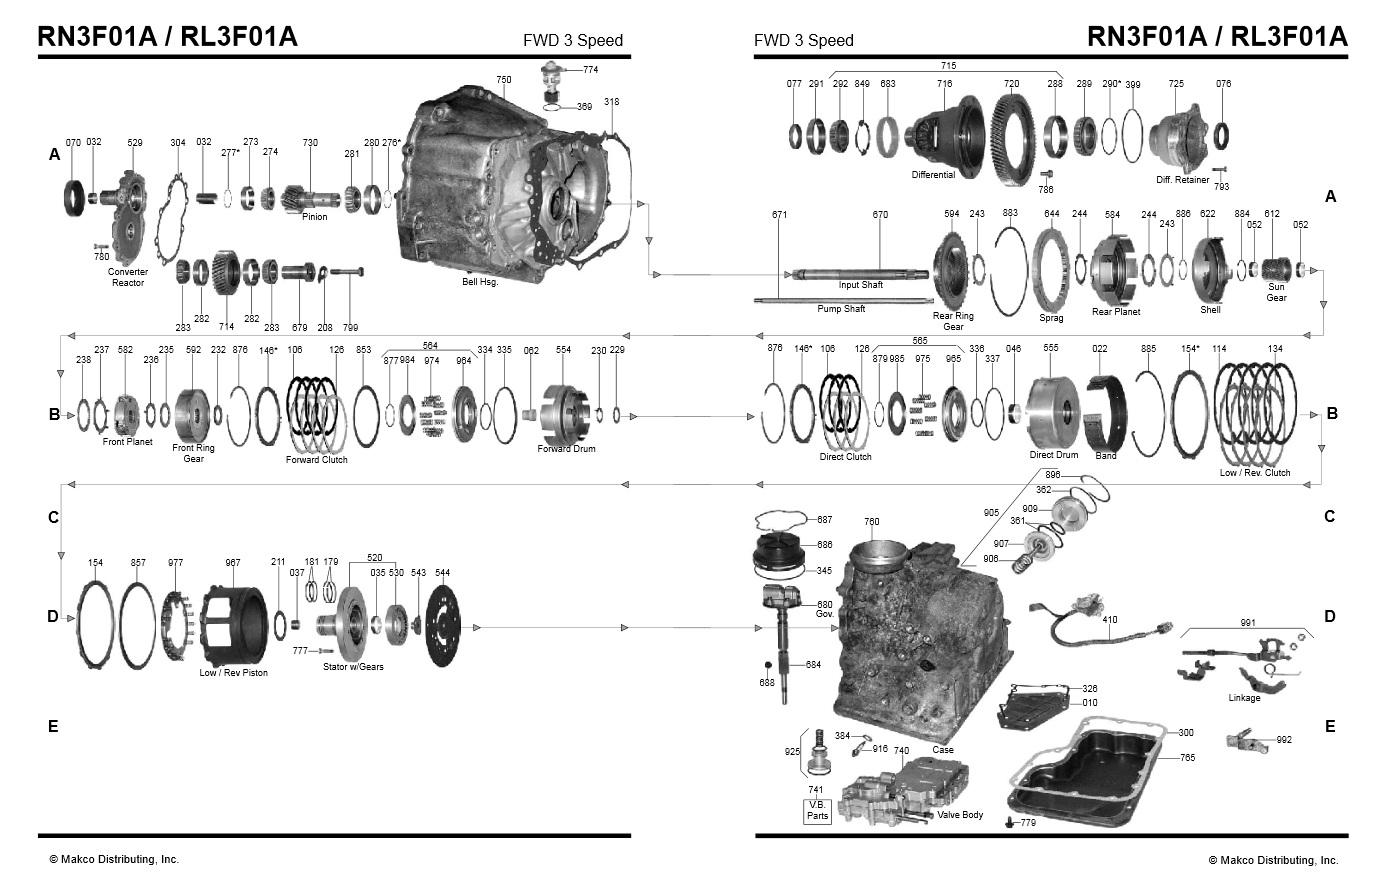 Transmission Repair Manuals Rl3f01a Rn3f01a